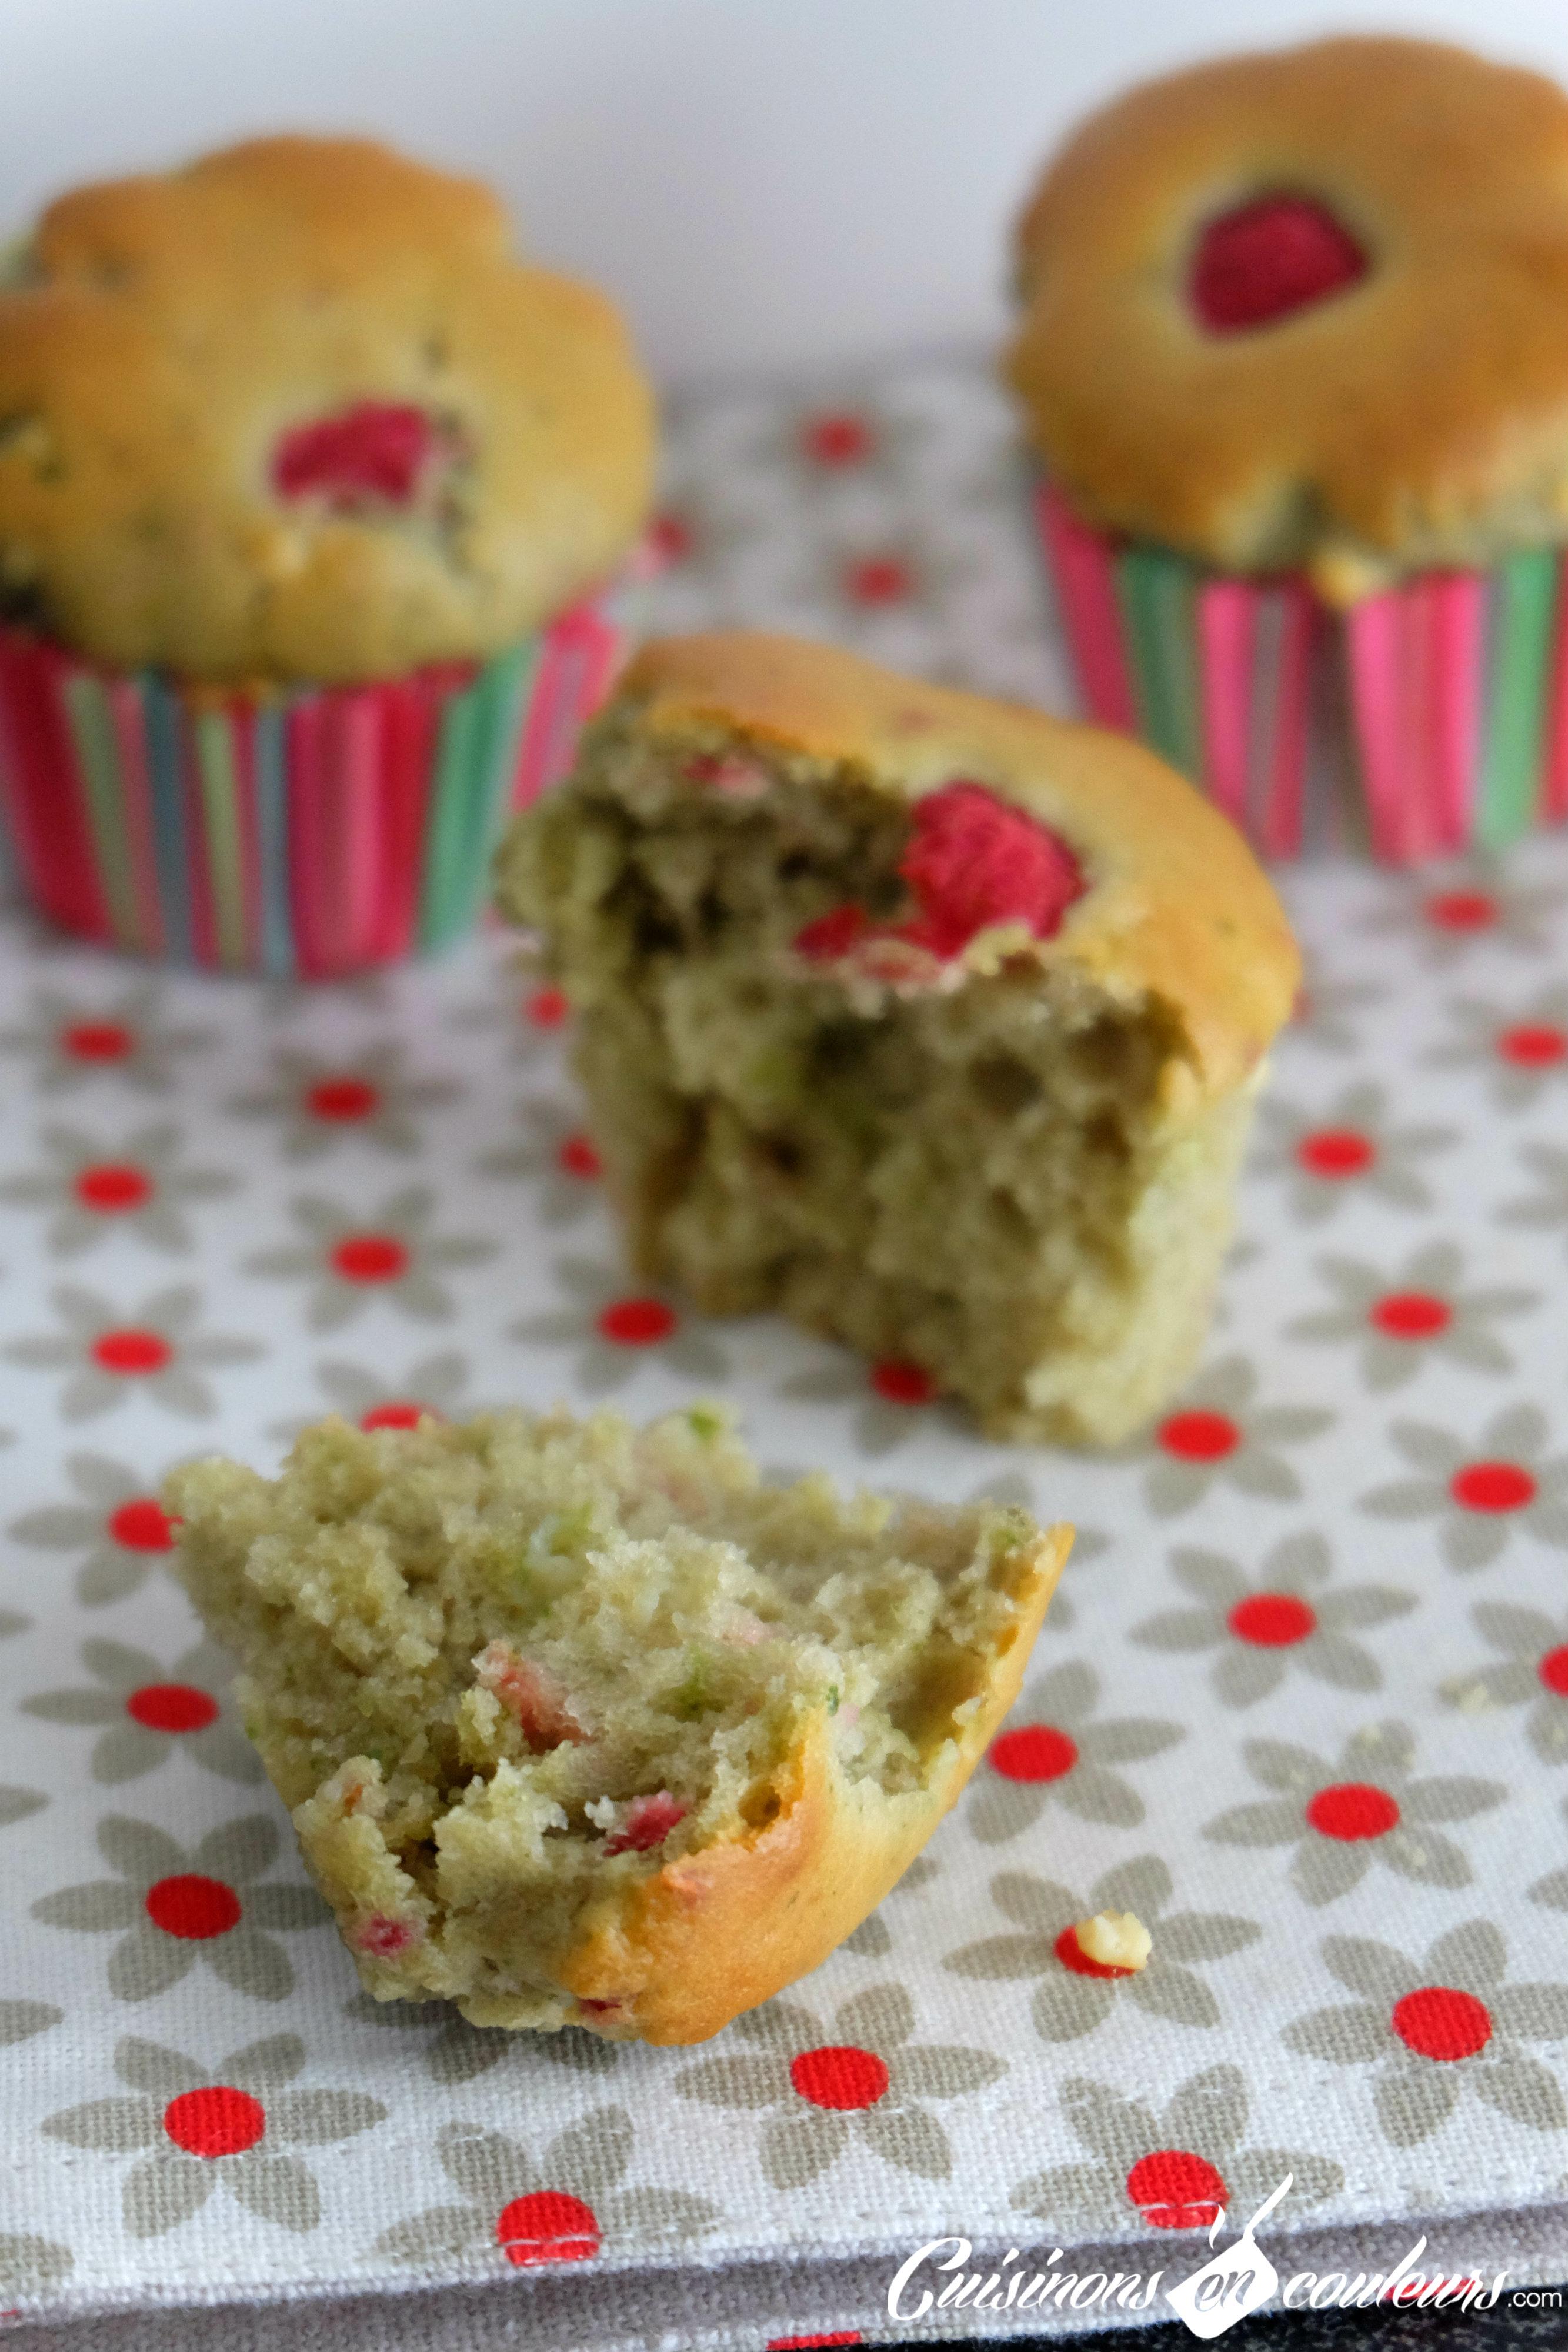 Muffins Au The Matcha Aux Framboises Et Au Chocolat Blanc